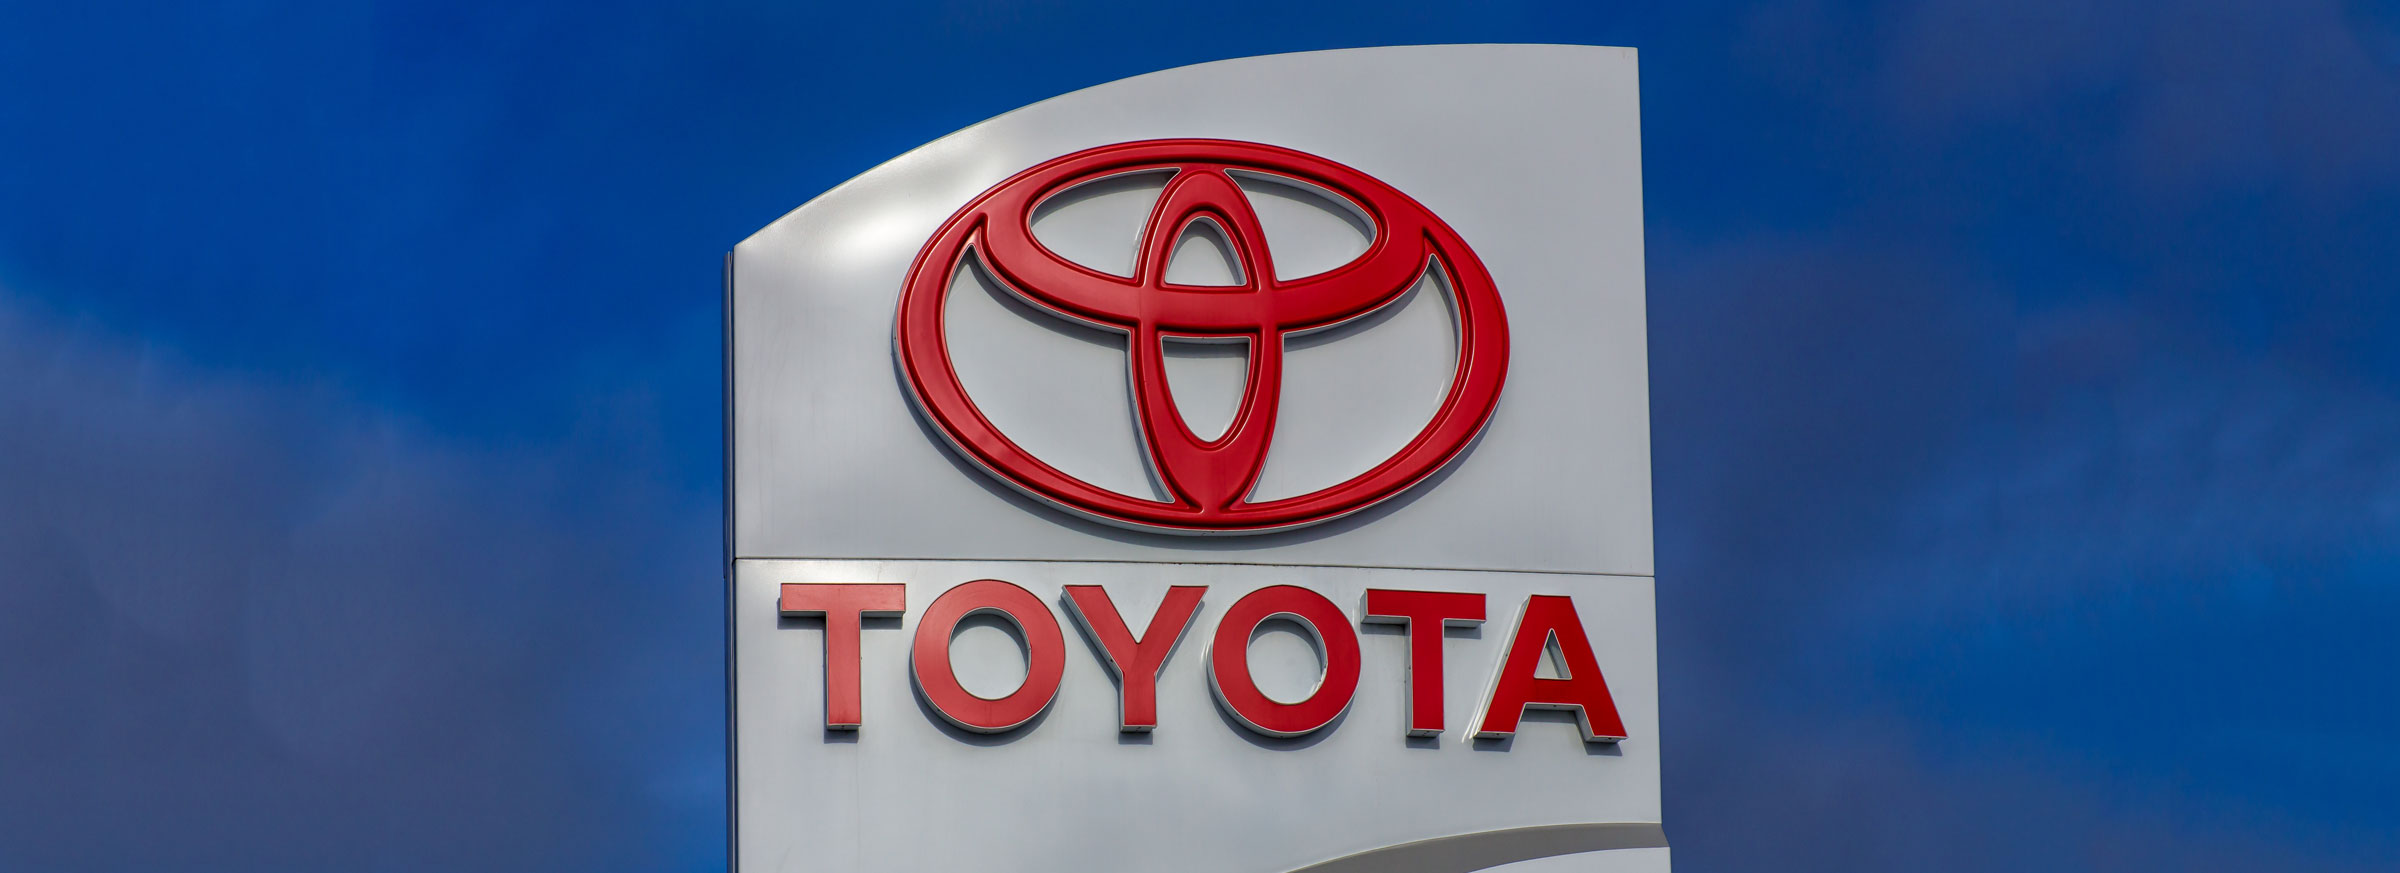 Toyota Riverside Directions